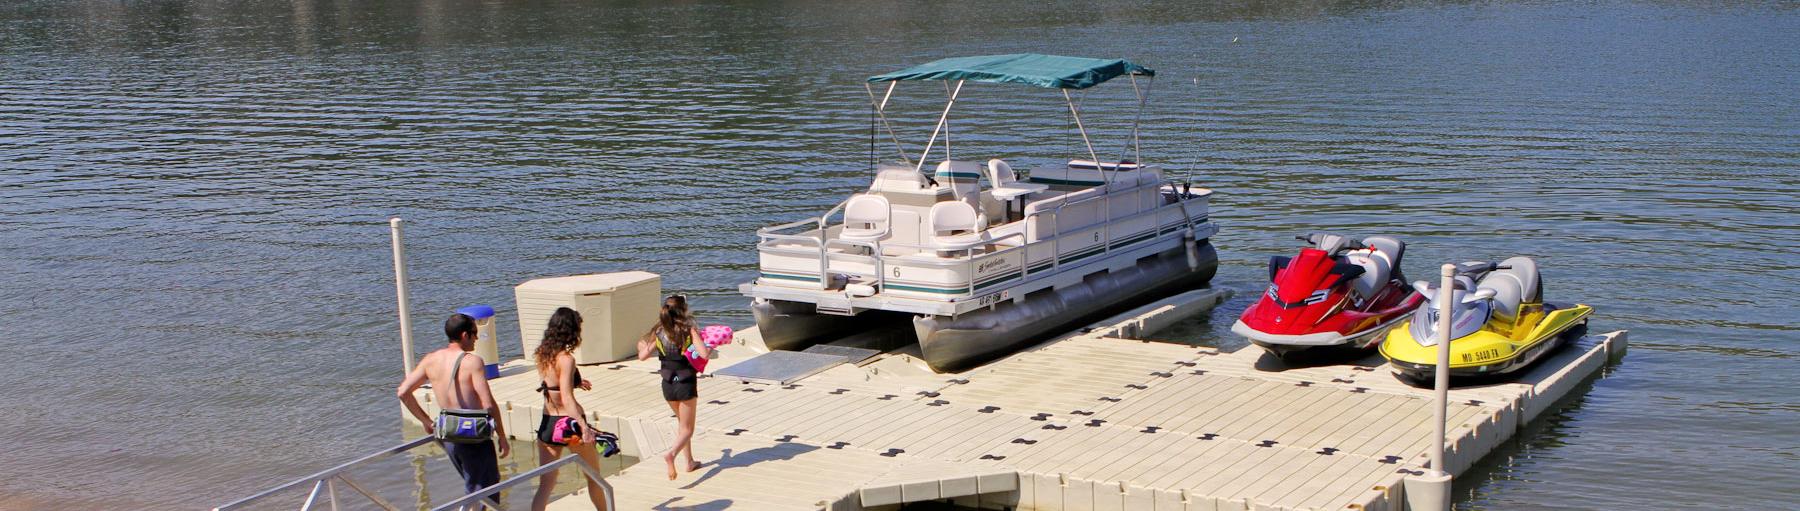 boatport-waverunners